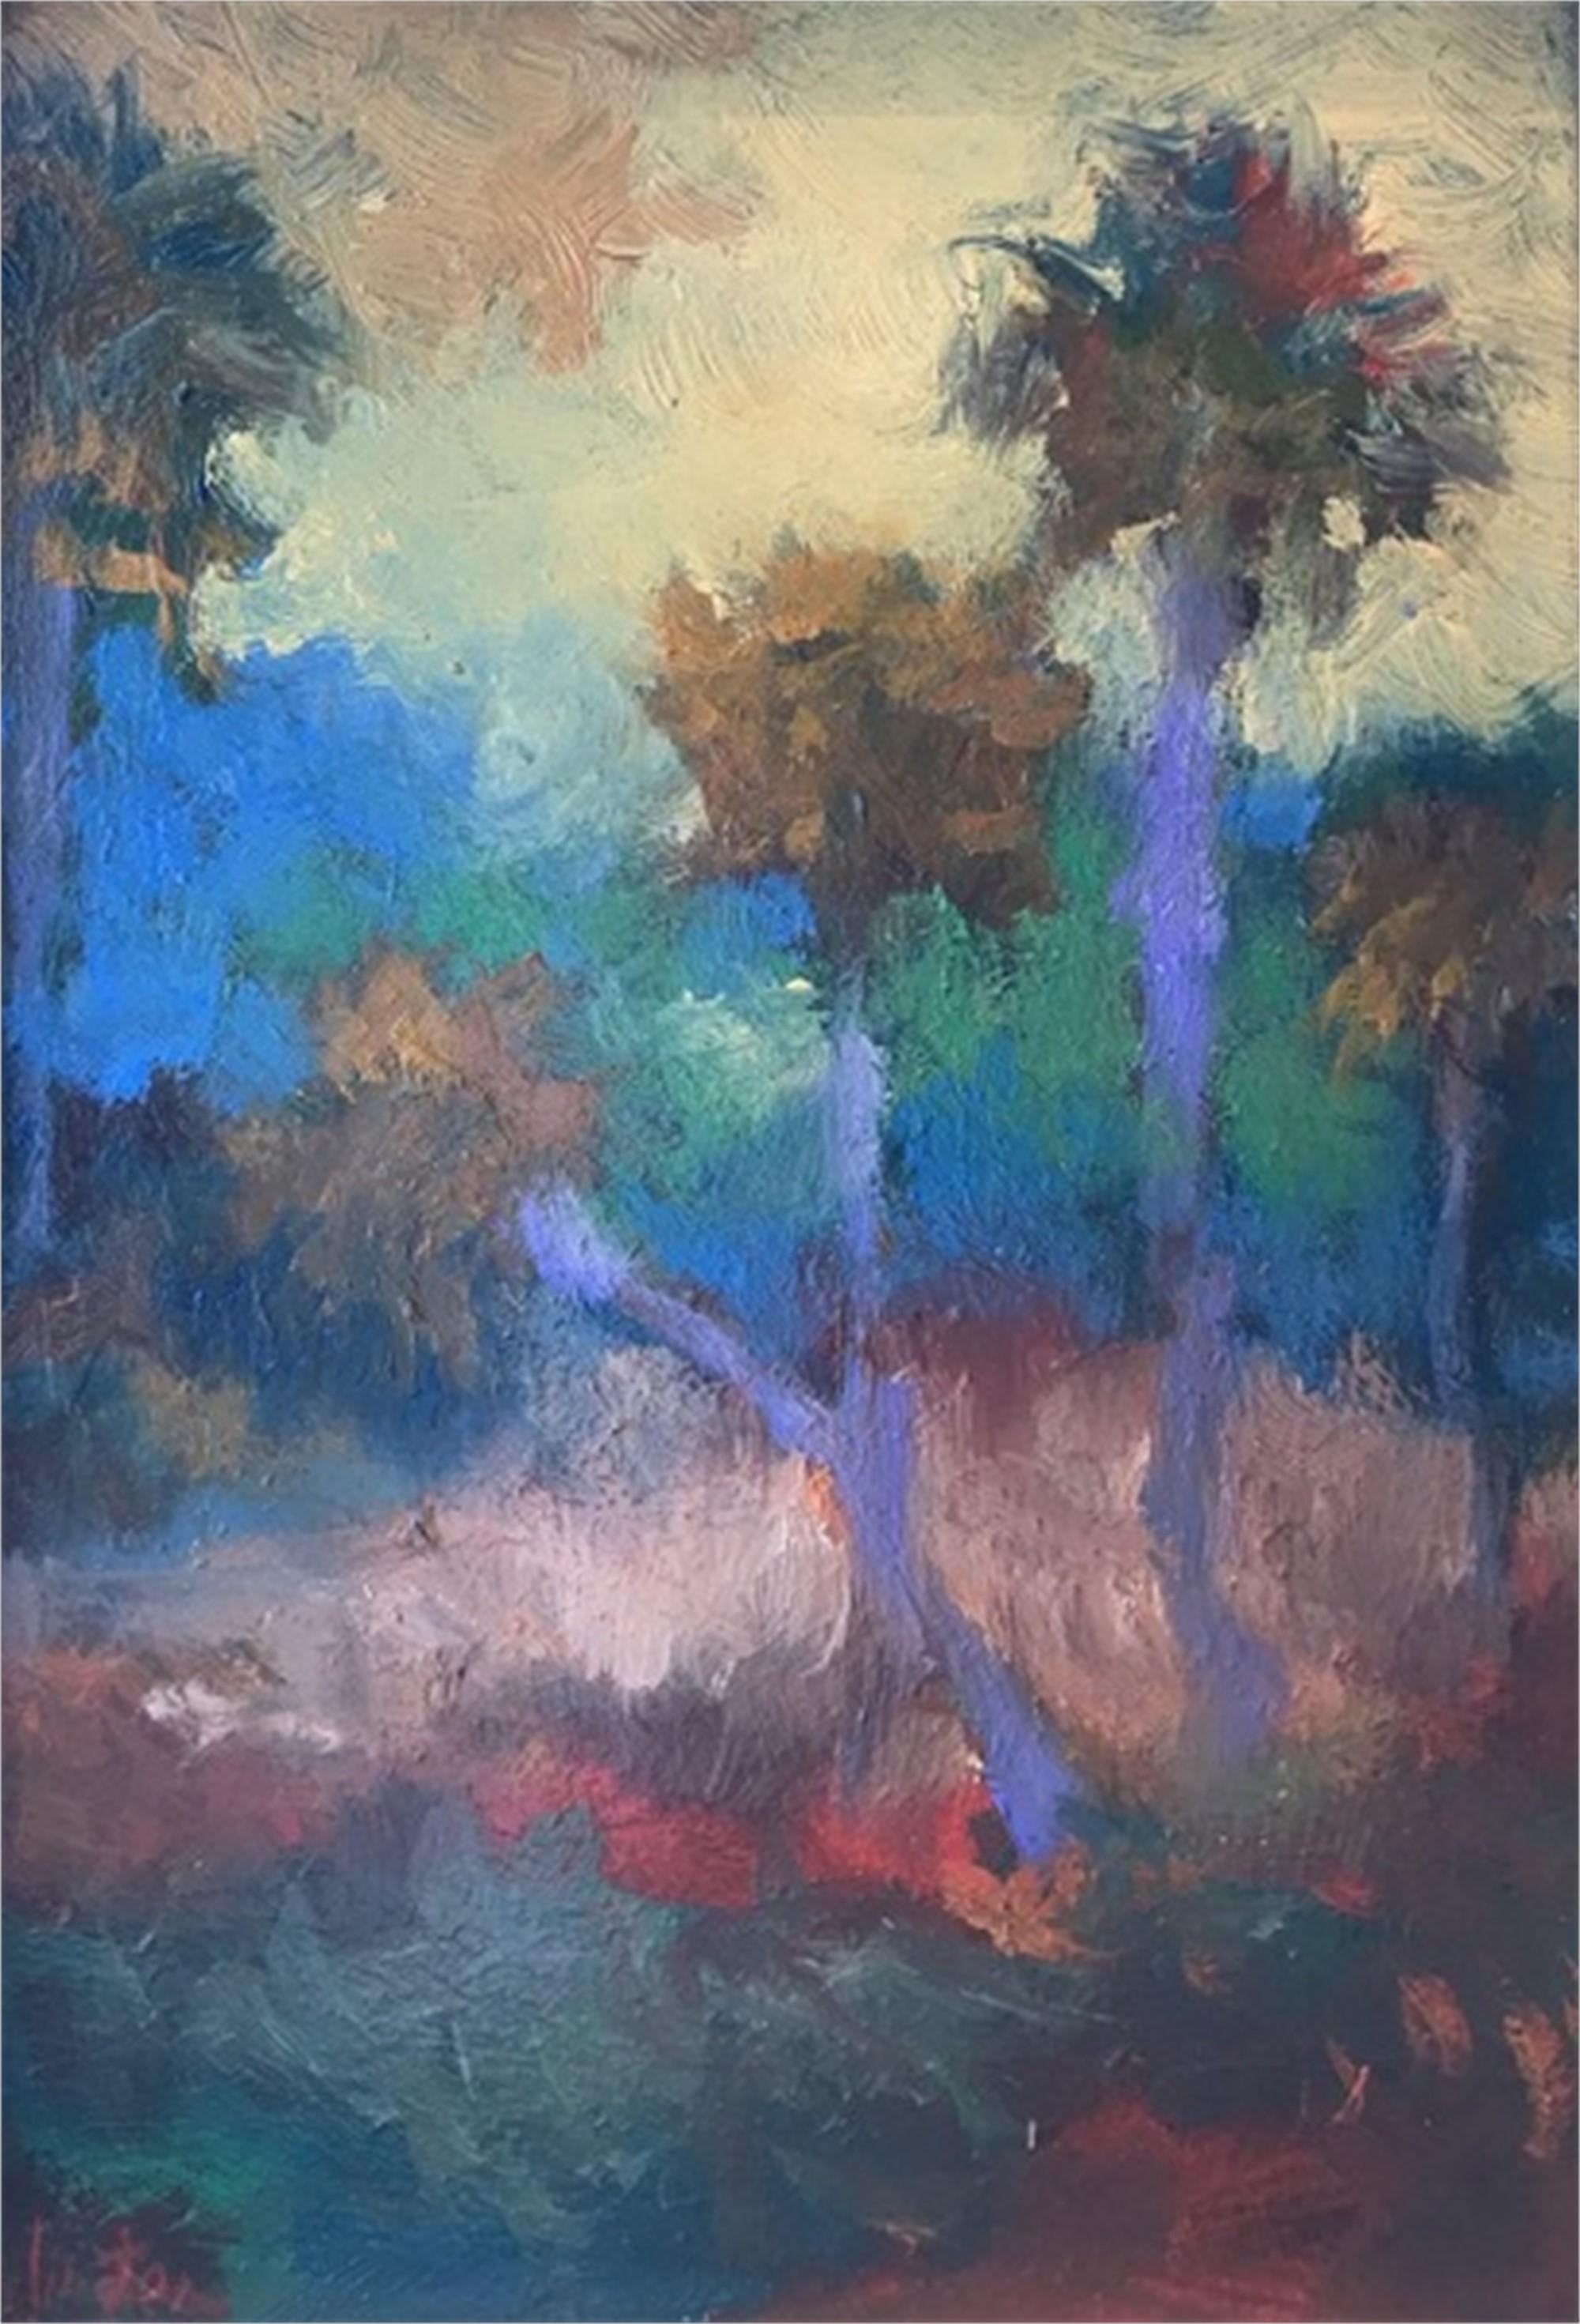 Palmettos In Sunlight by Jim Darlington